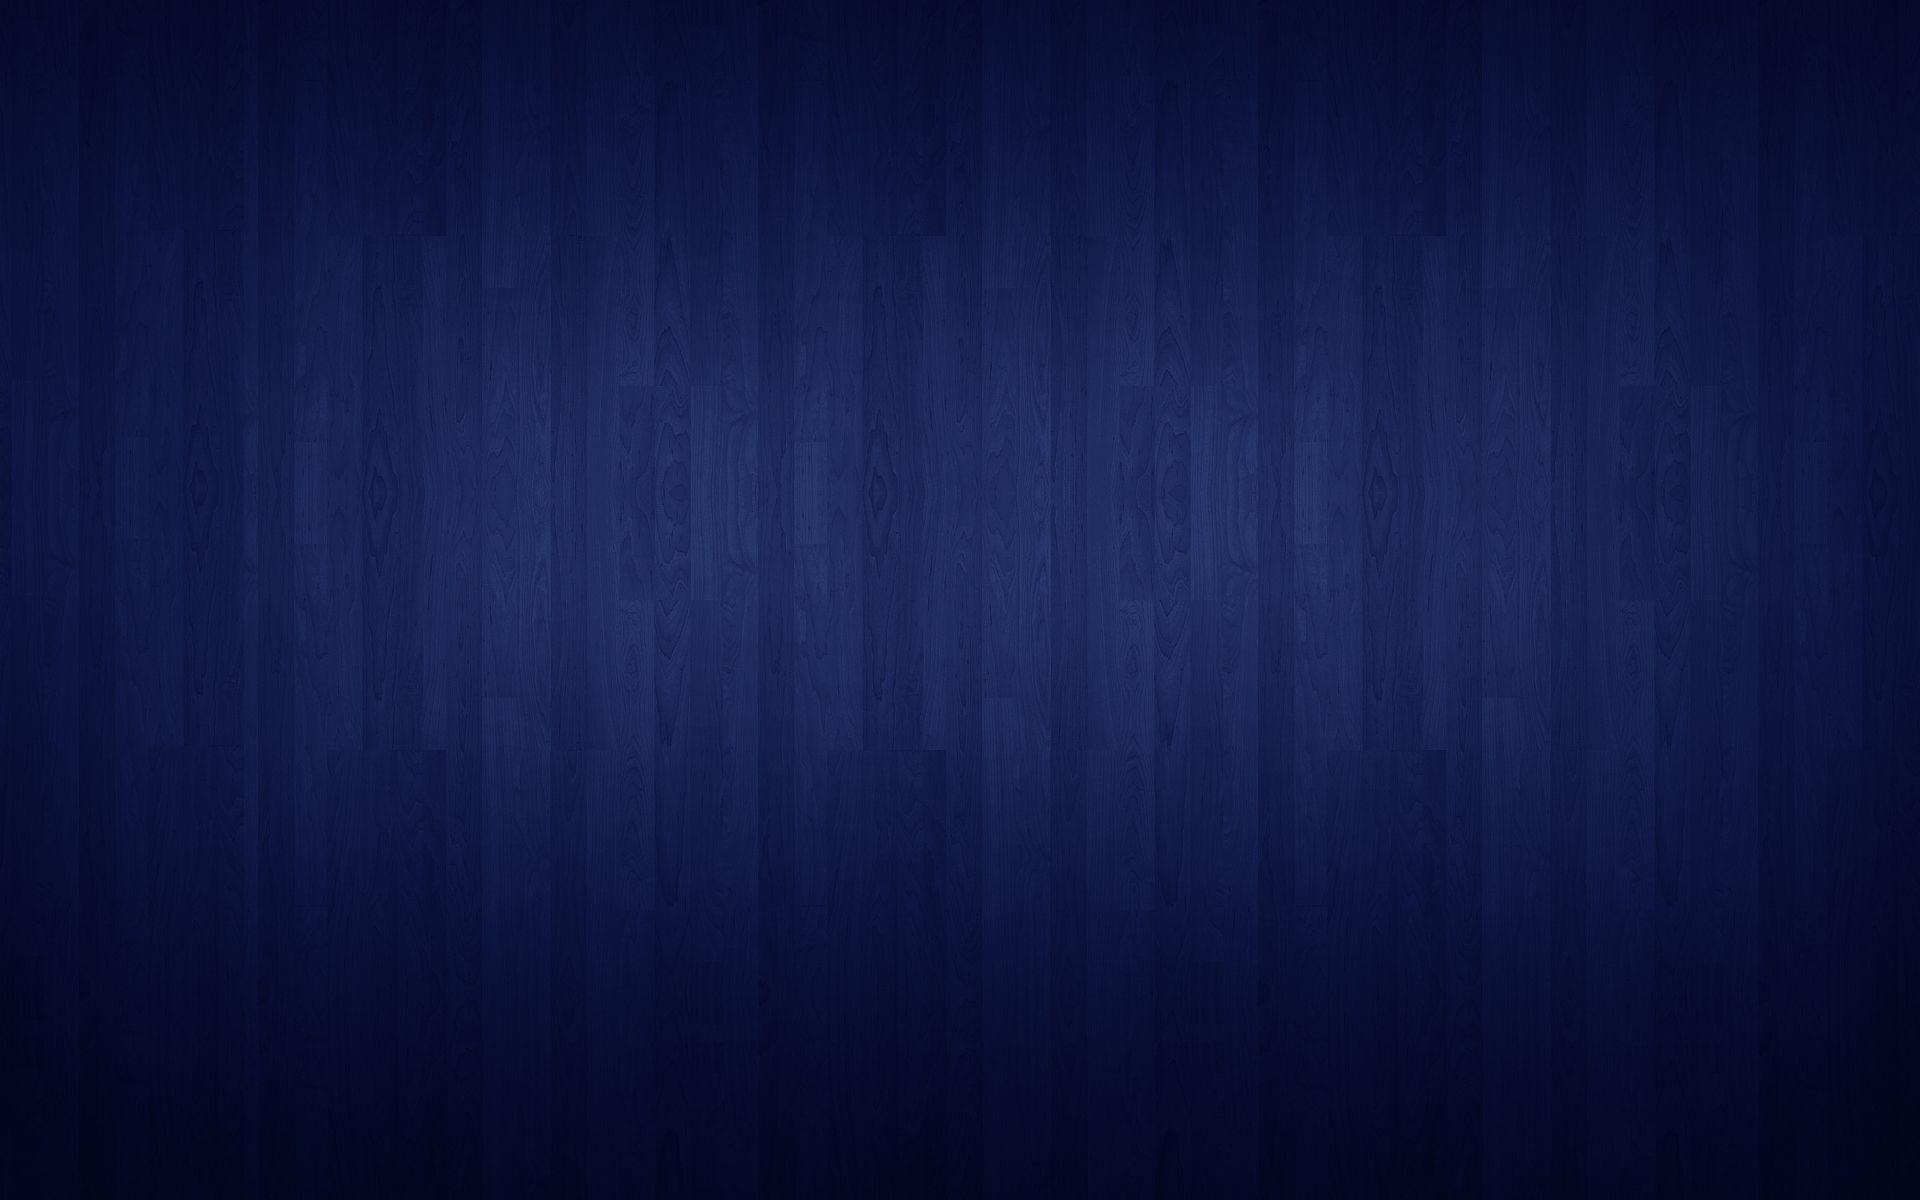 dllTcep.jpg (1920×1200) | Patterns | Pinterest | Blues, Wallpapers and Navy  blue